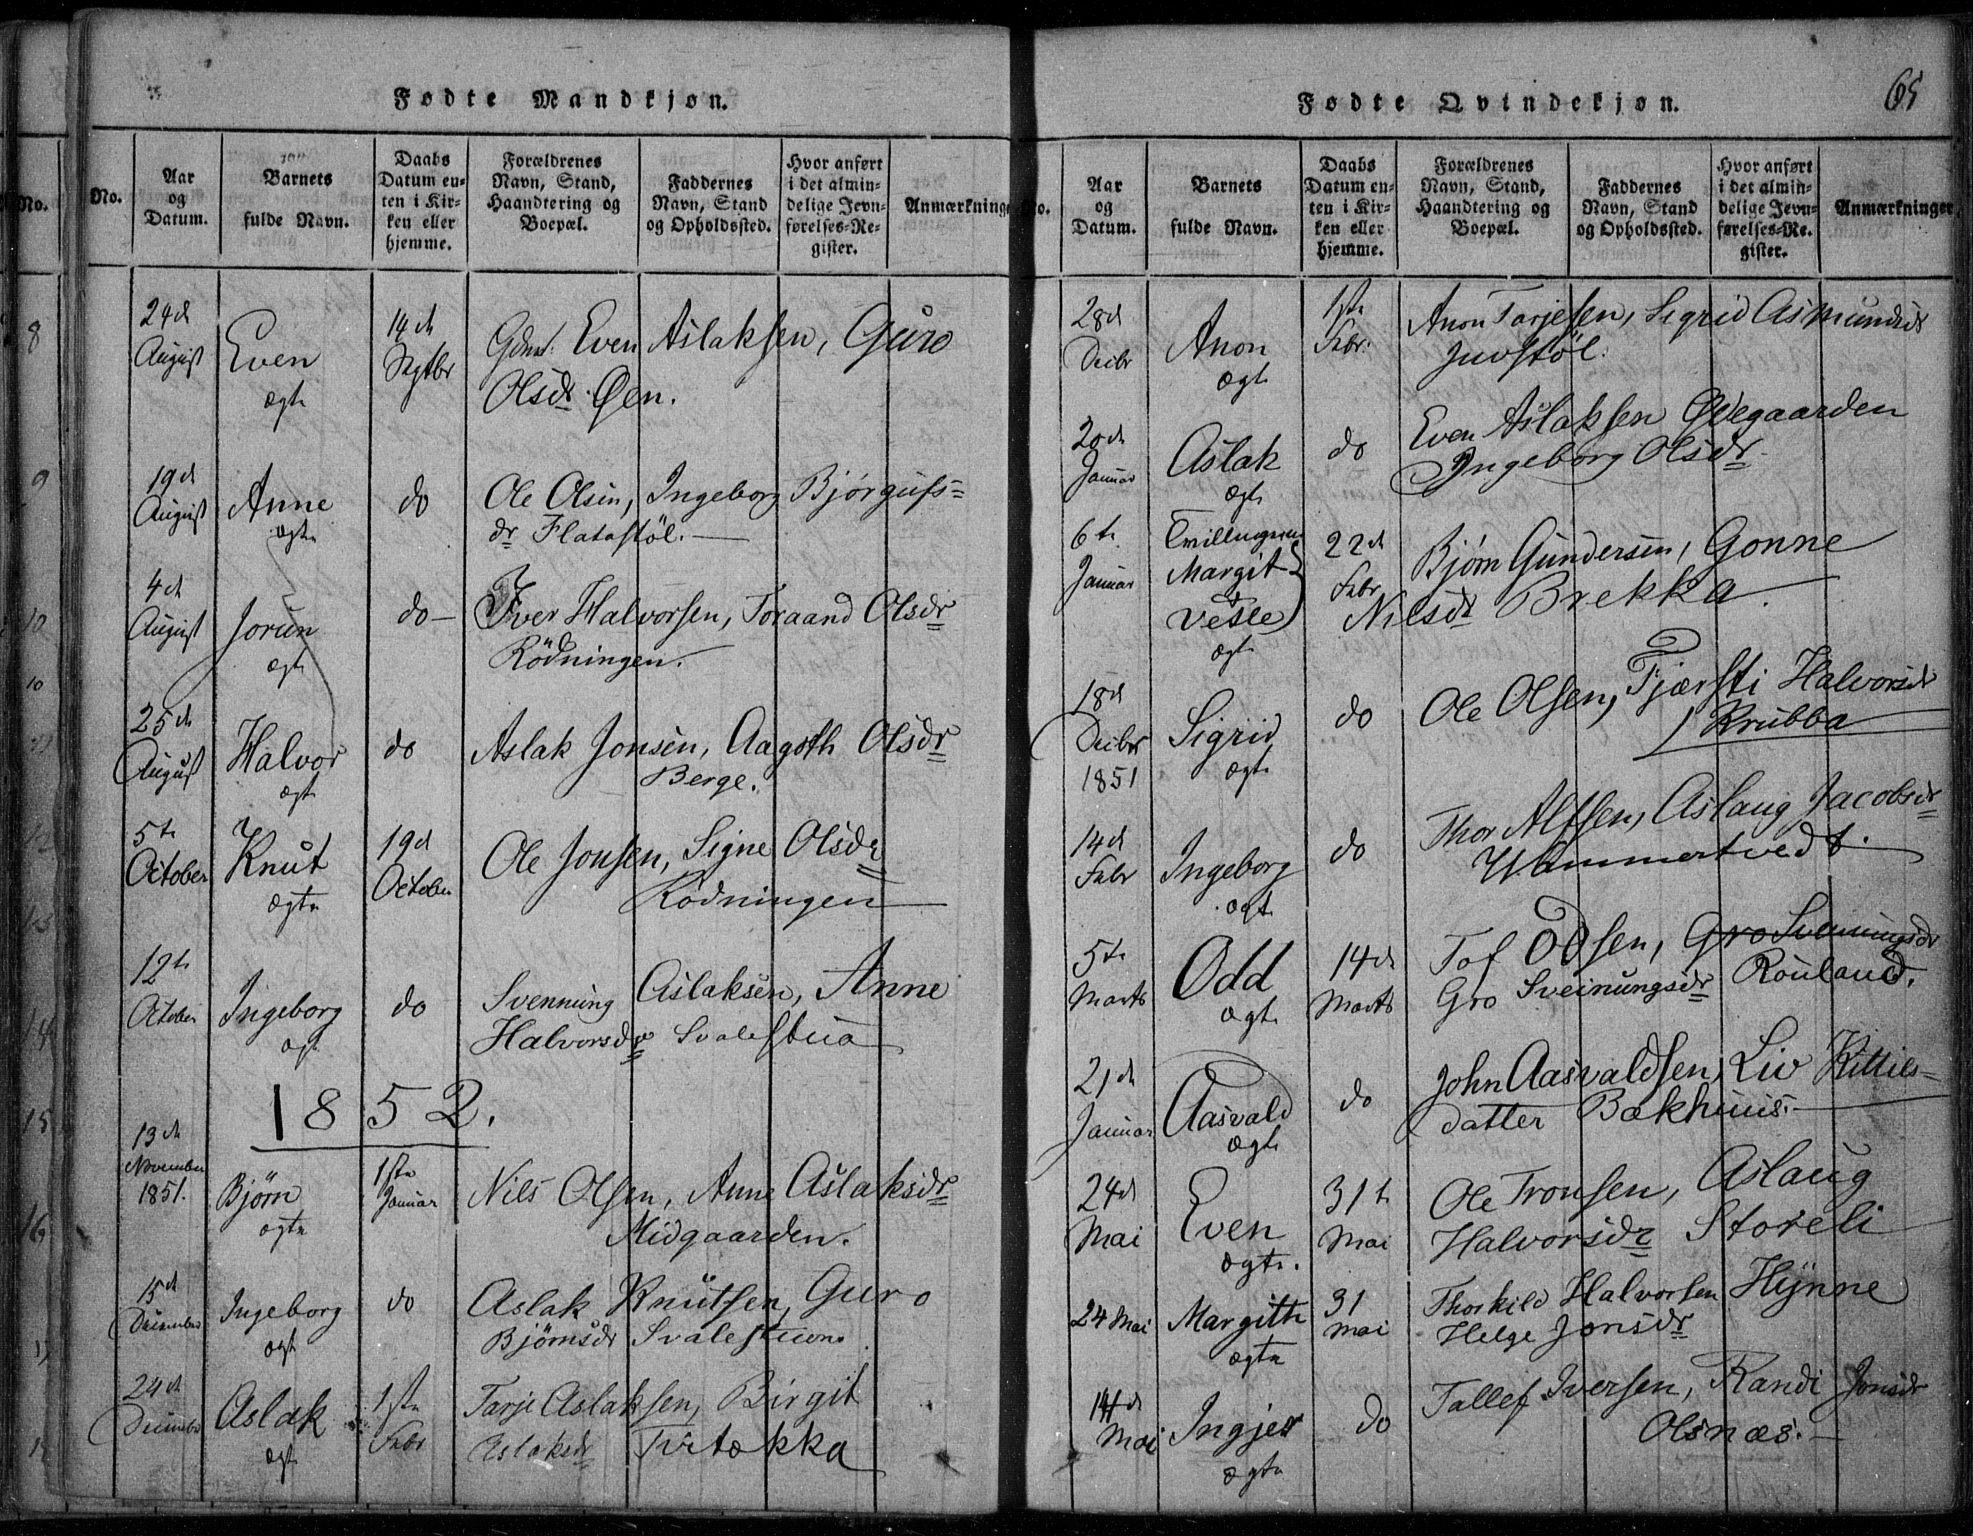 SAKO, Rauland kirkebøker, F/Fa/L0001: Ministerialbok nr. 1, 1814-1859, s. 65